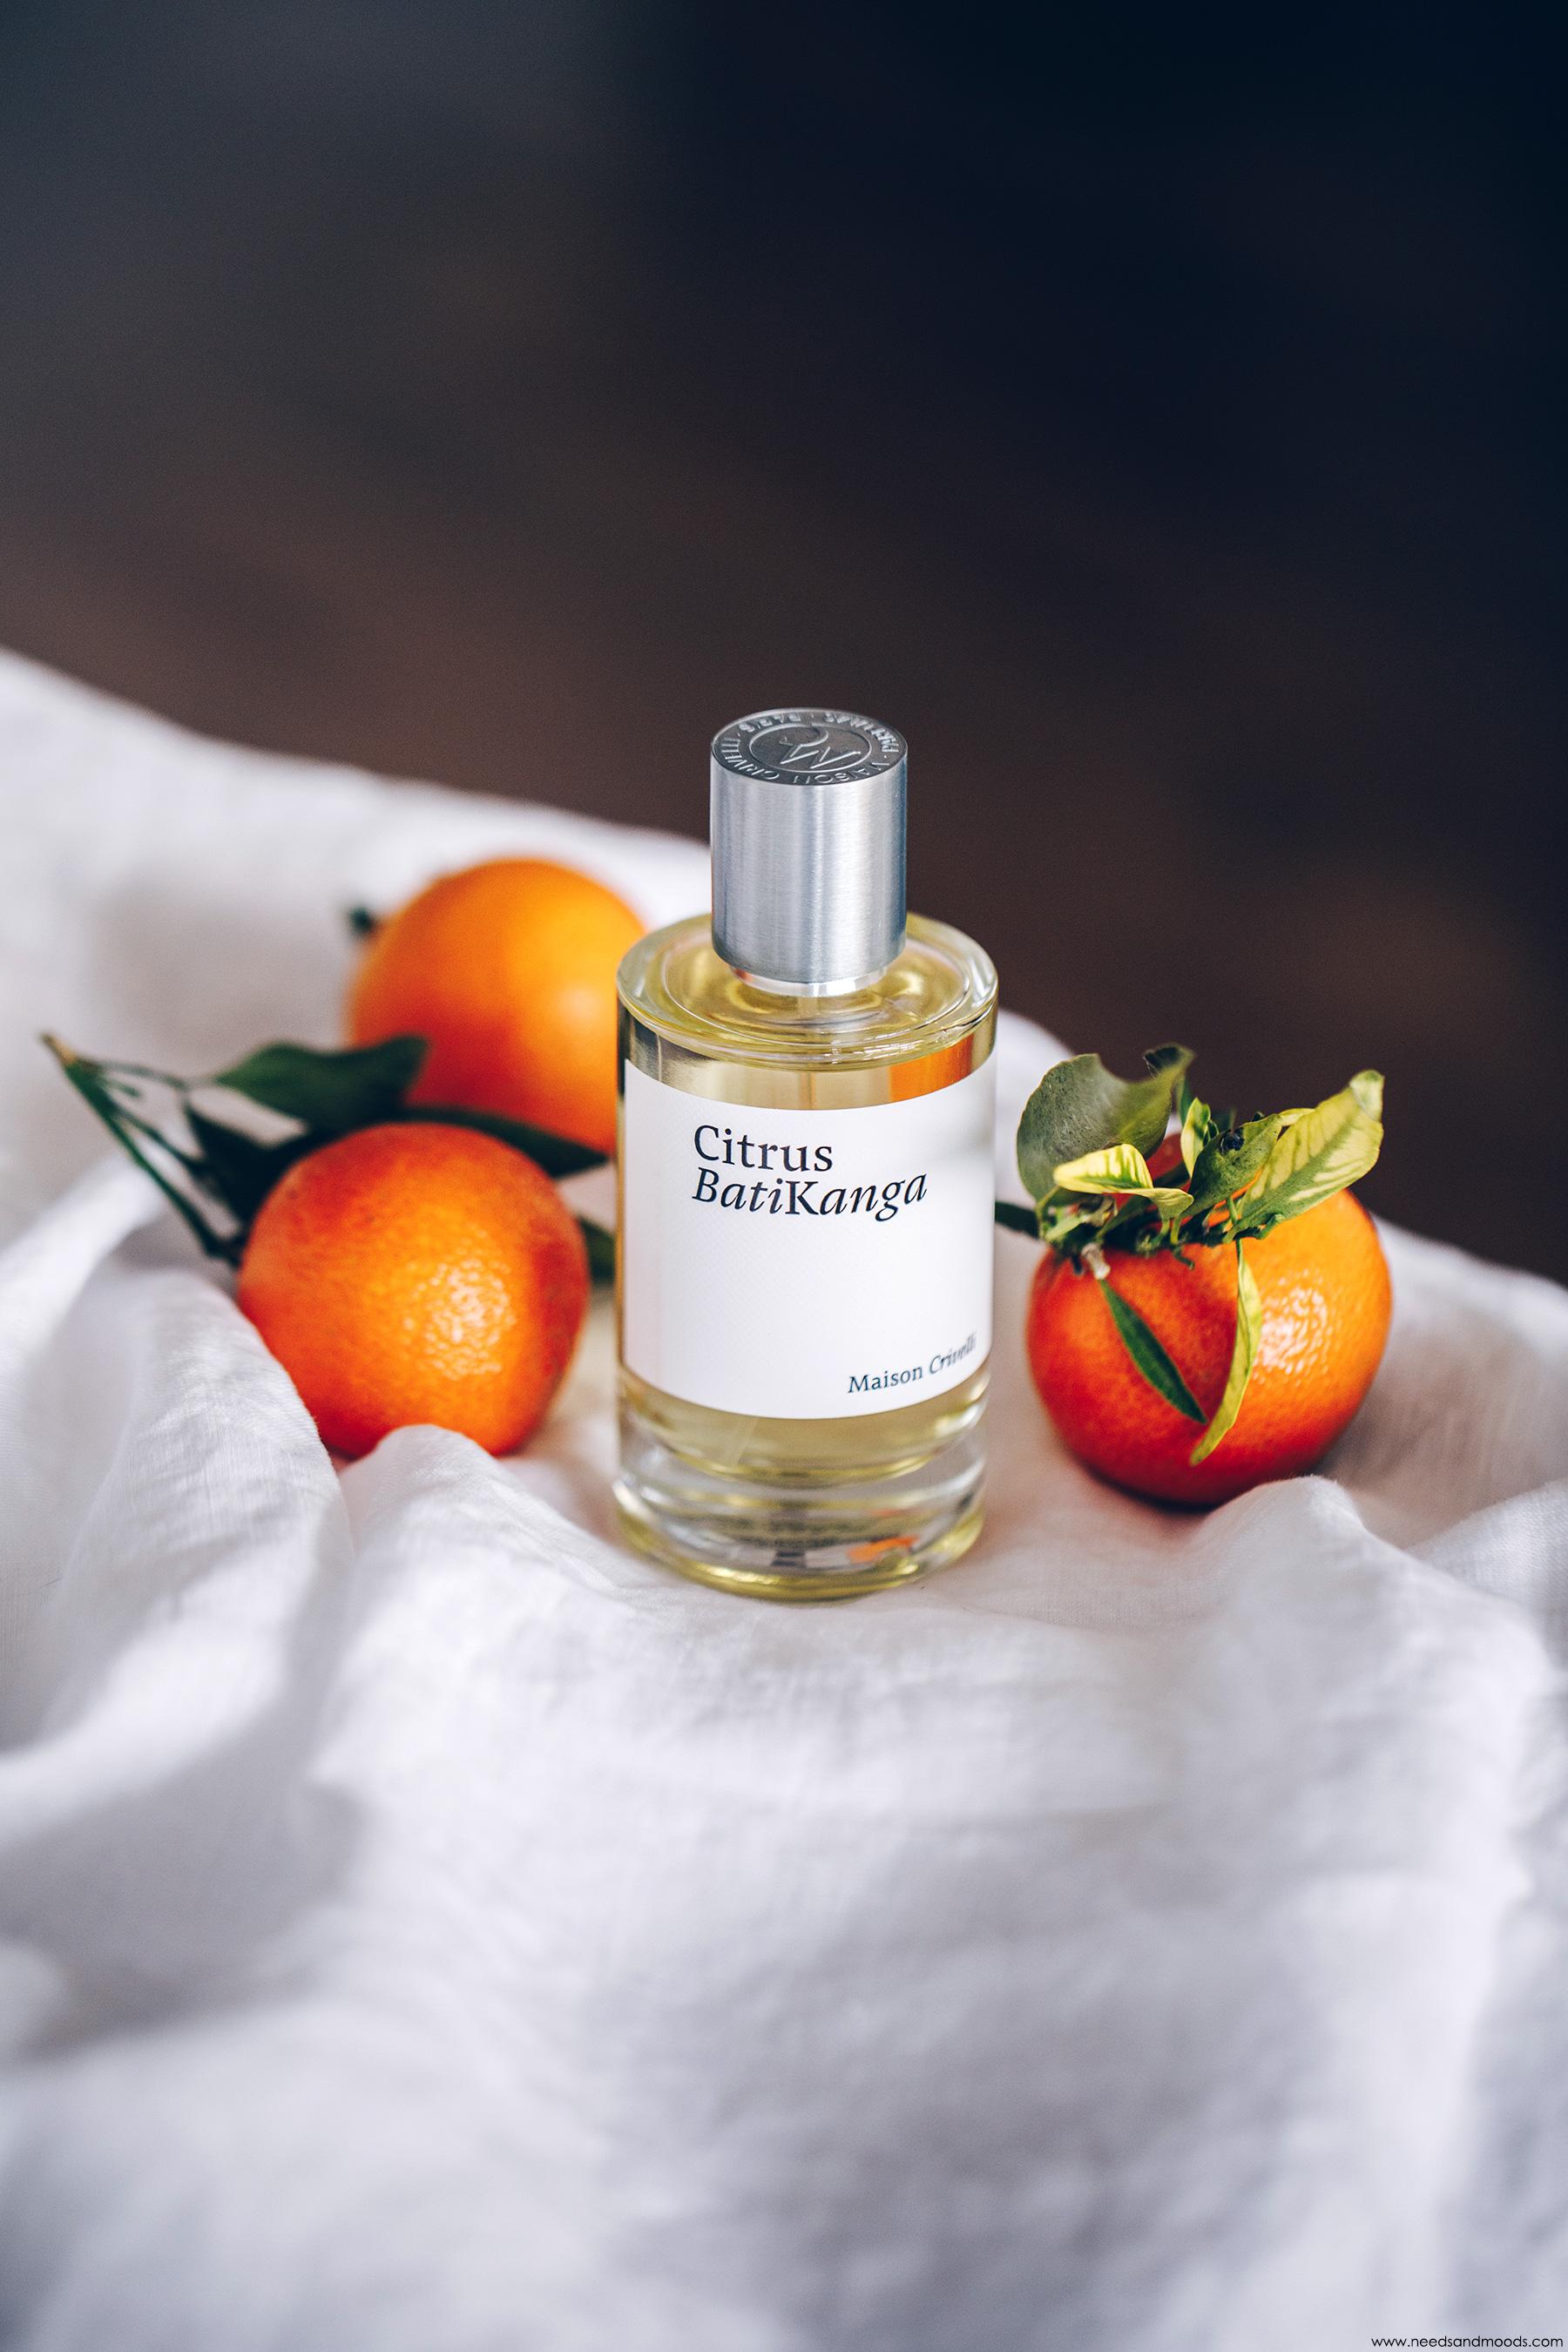 citrus batikanga eau de parfum